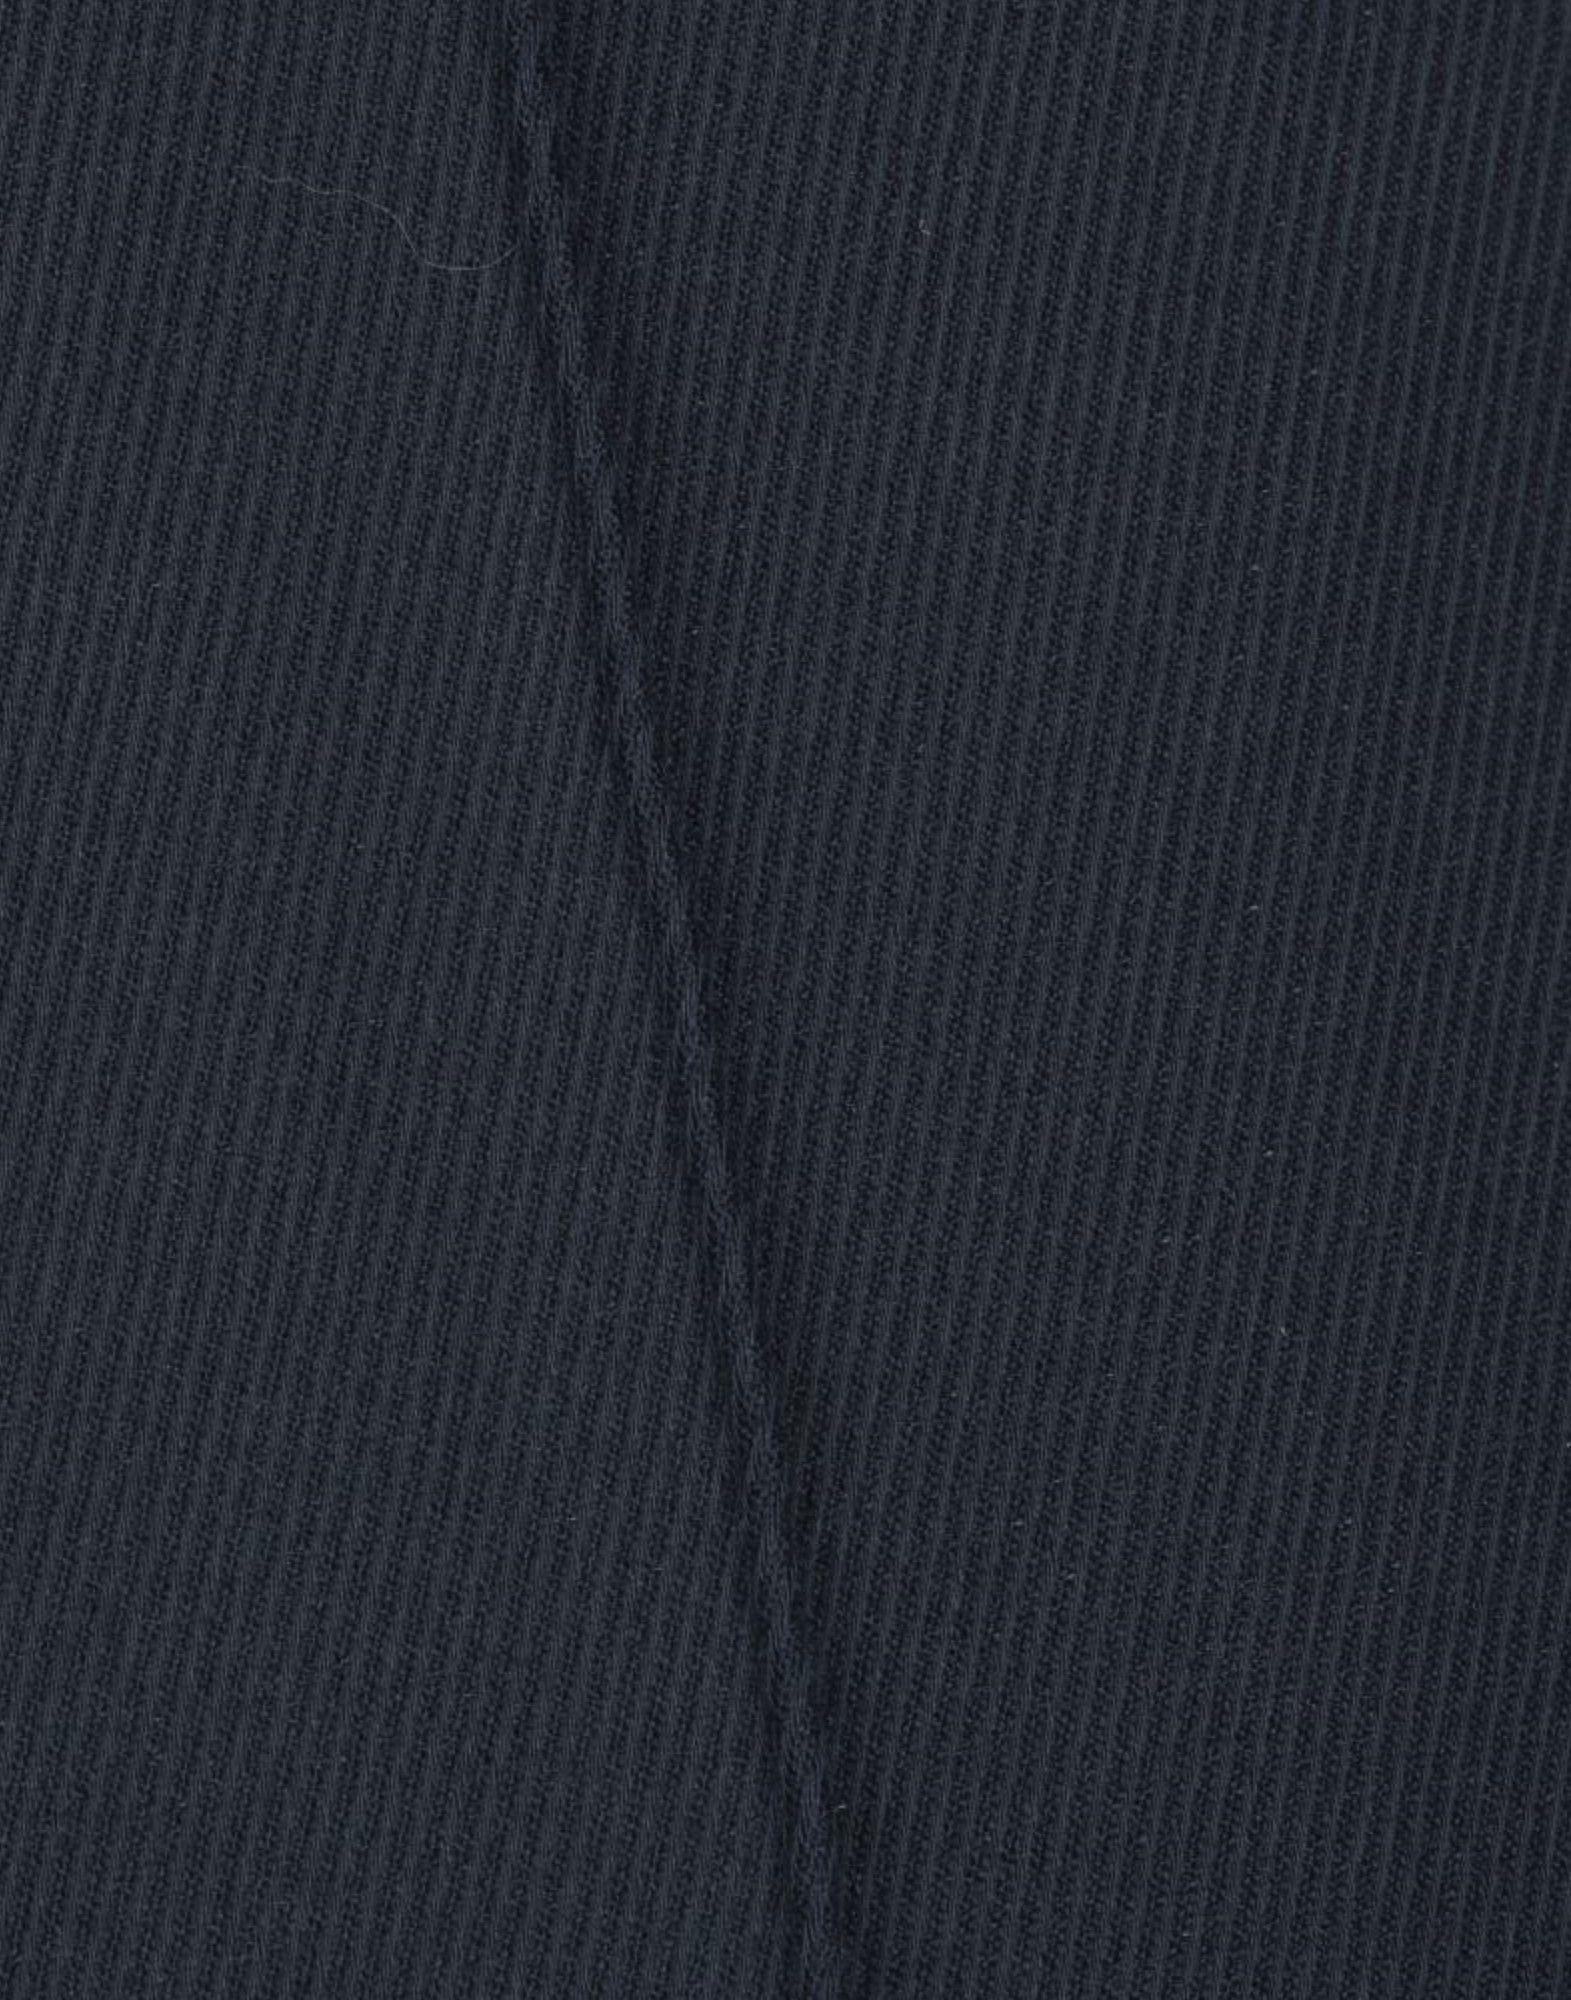 Pantalones Marni de Tejido sintético de color Azul